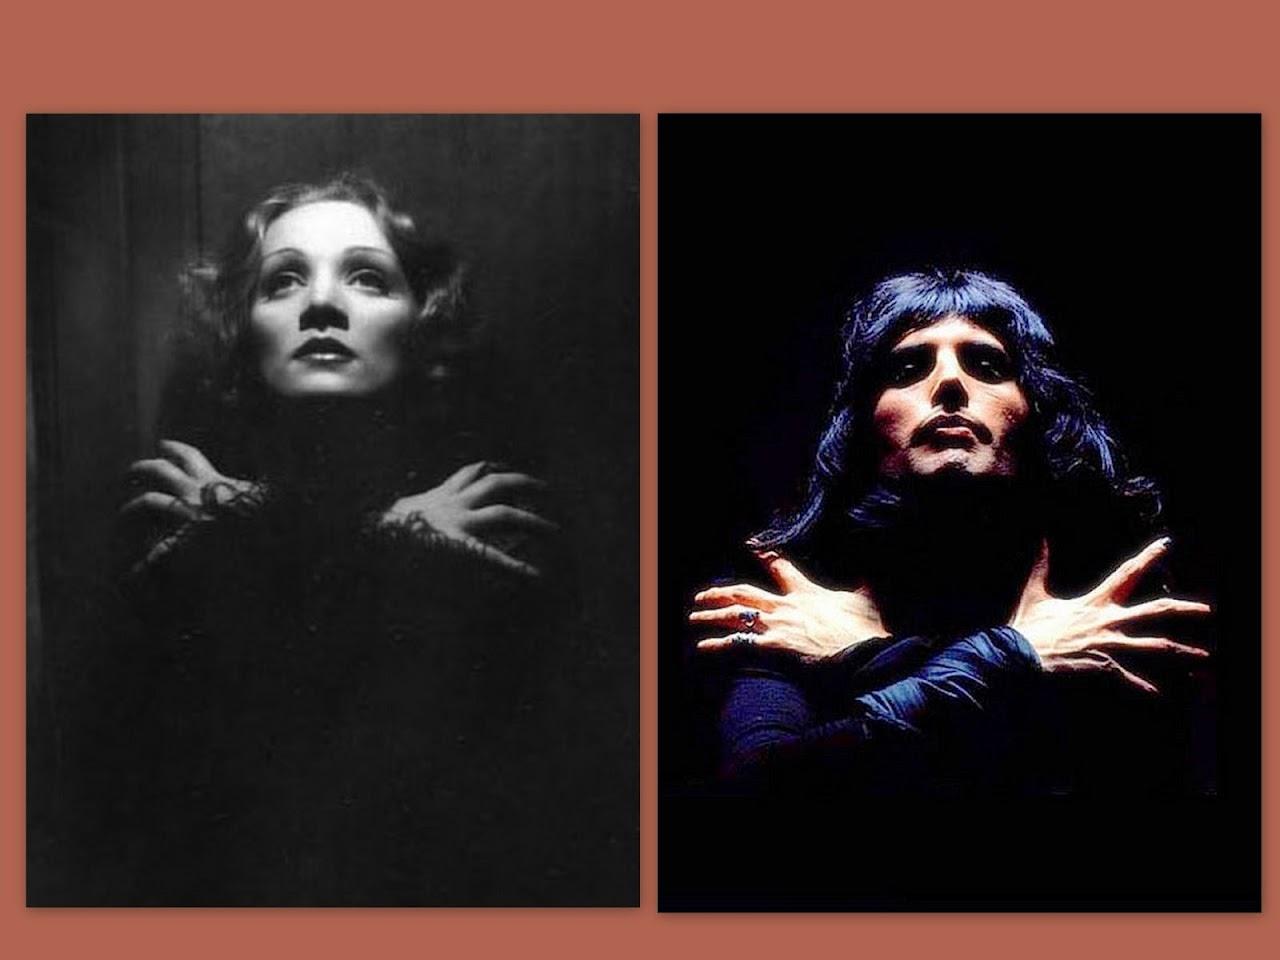 http://1.bp.blogspot.com/-O_qyeTc0v2w/TiaazPABmuI/AAAAAAAABKg/xRIH4n3DGzU/s1280/Marlene+Dietrich++%2528Foto+Mick+Rock%2529.jpg